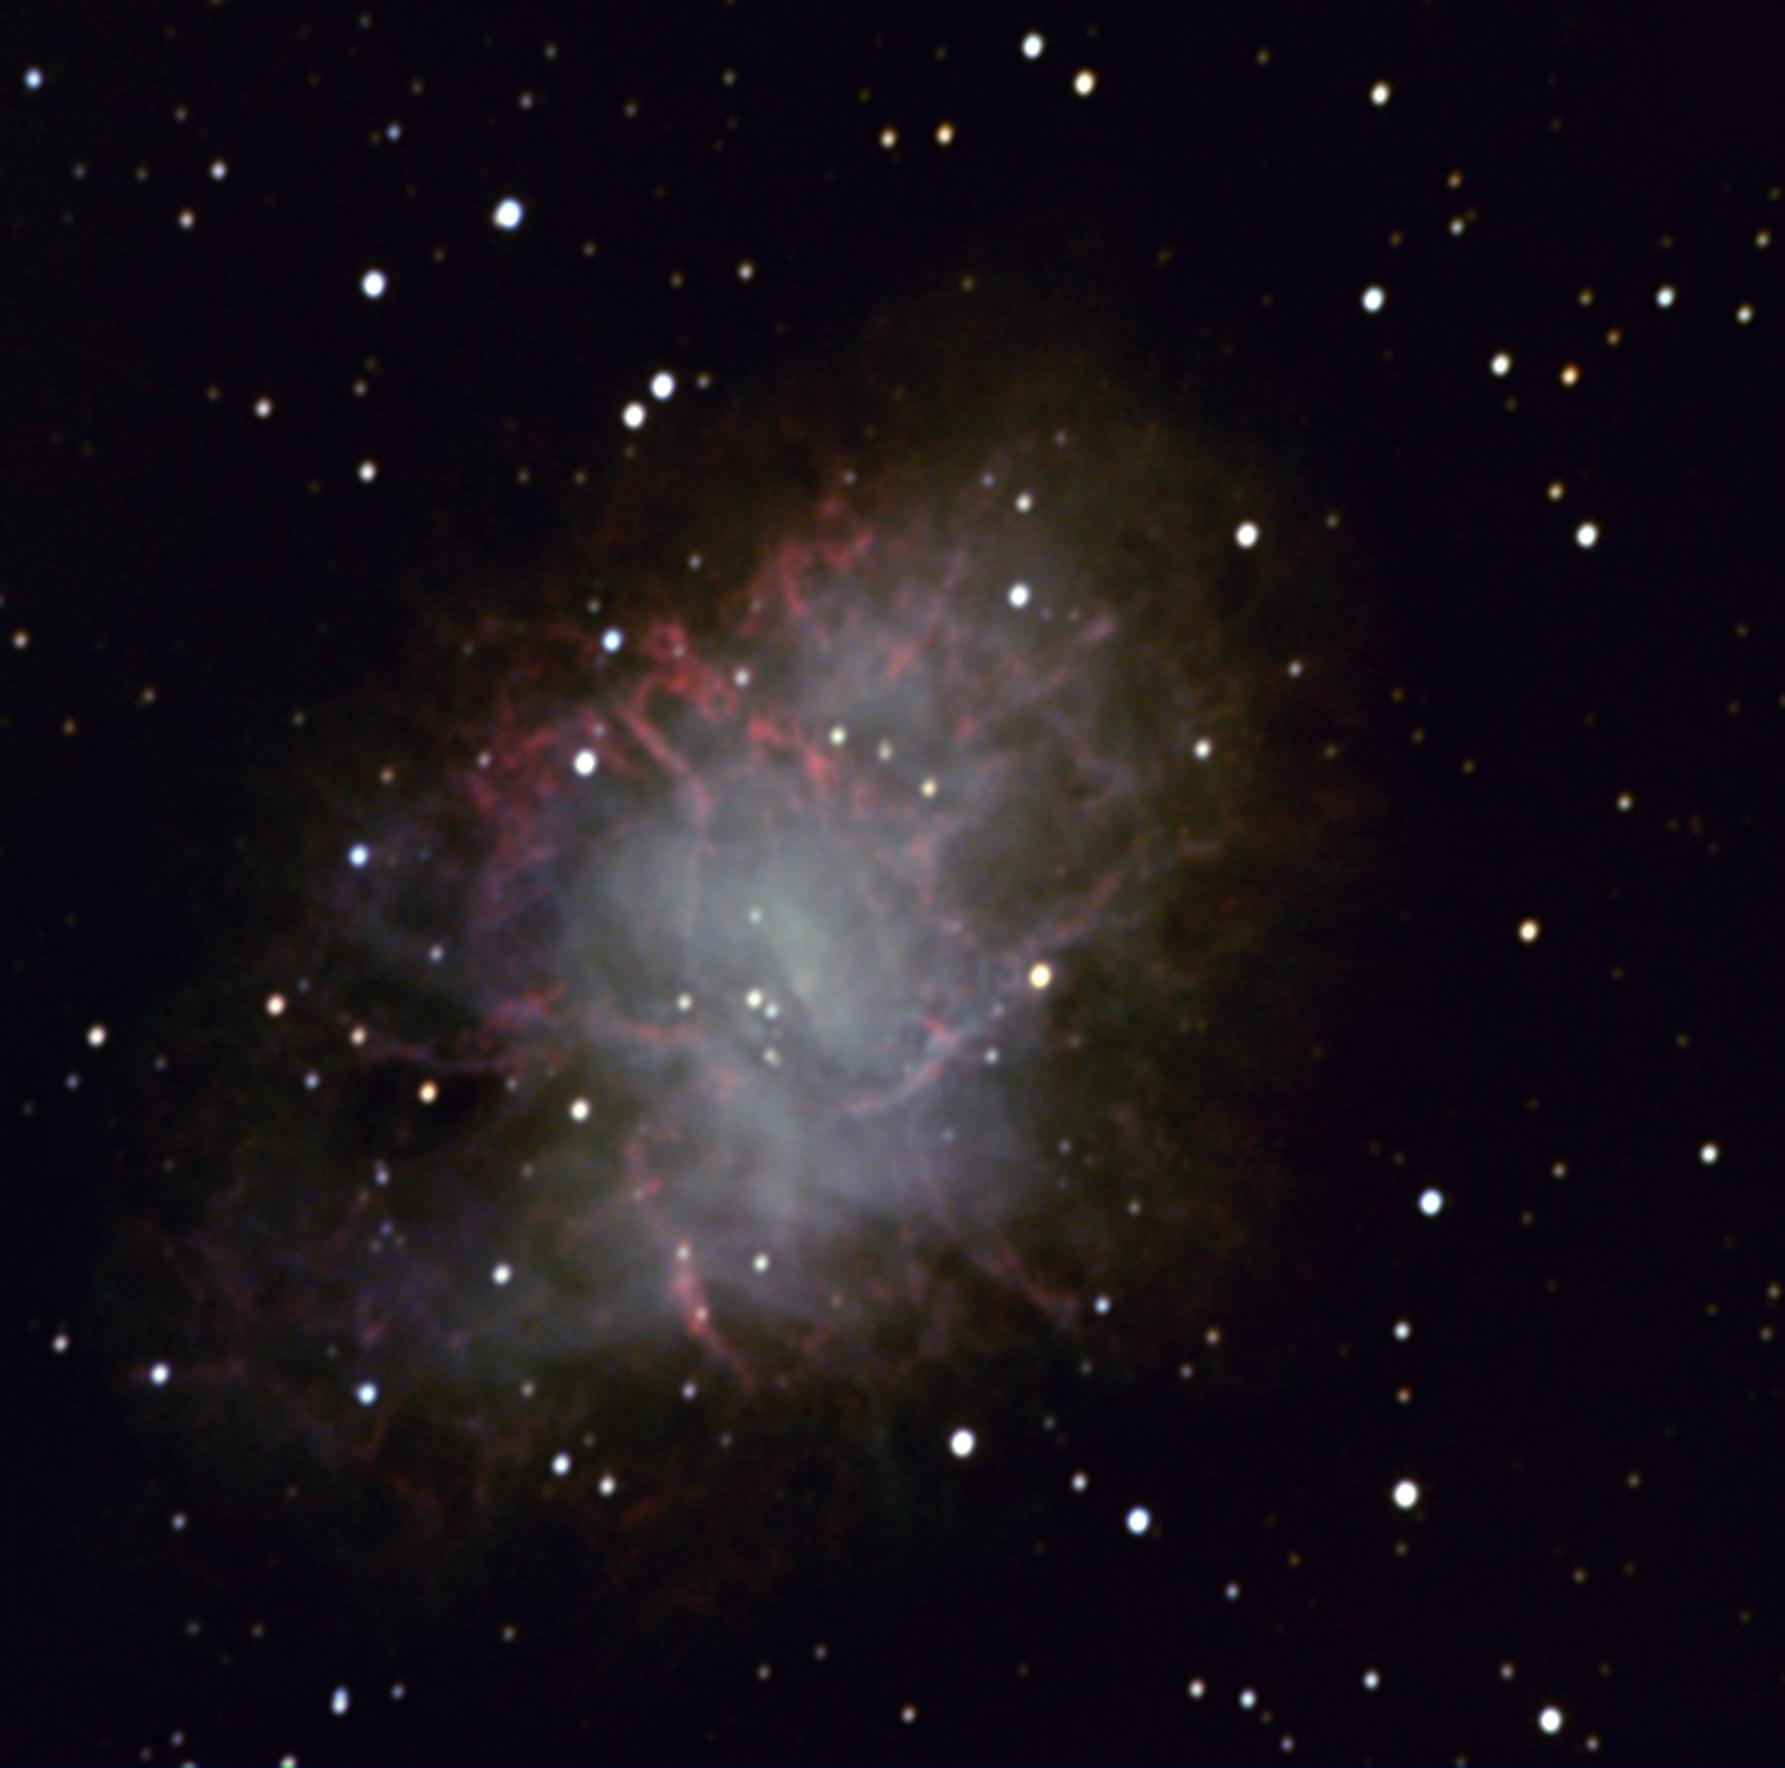 M1-Astrosurface-SIRILr_20210107210616496_pipp_stacked.jpg.4554168b010e9d76cc5597819b2388db.jpg